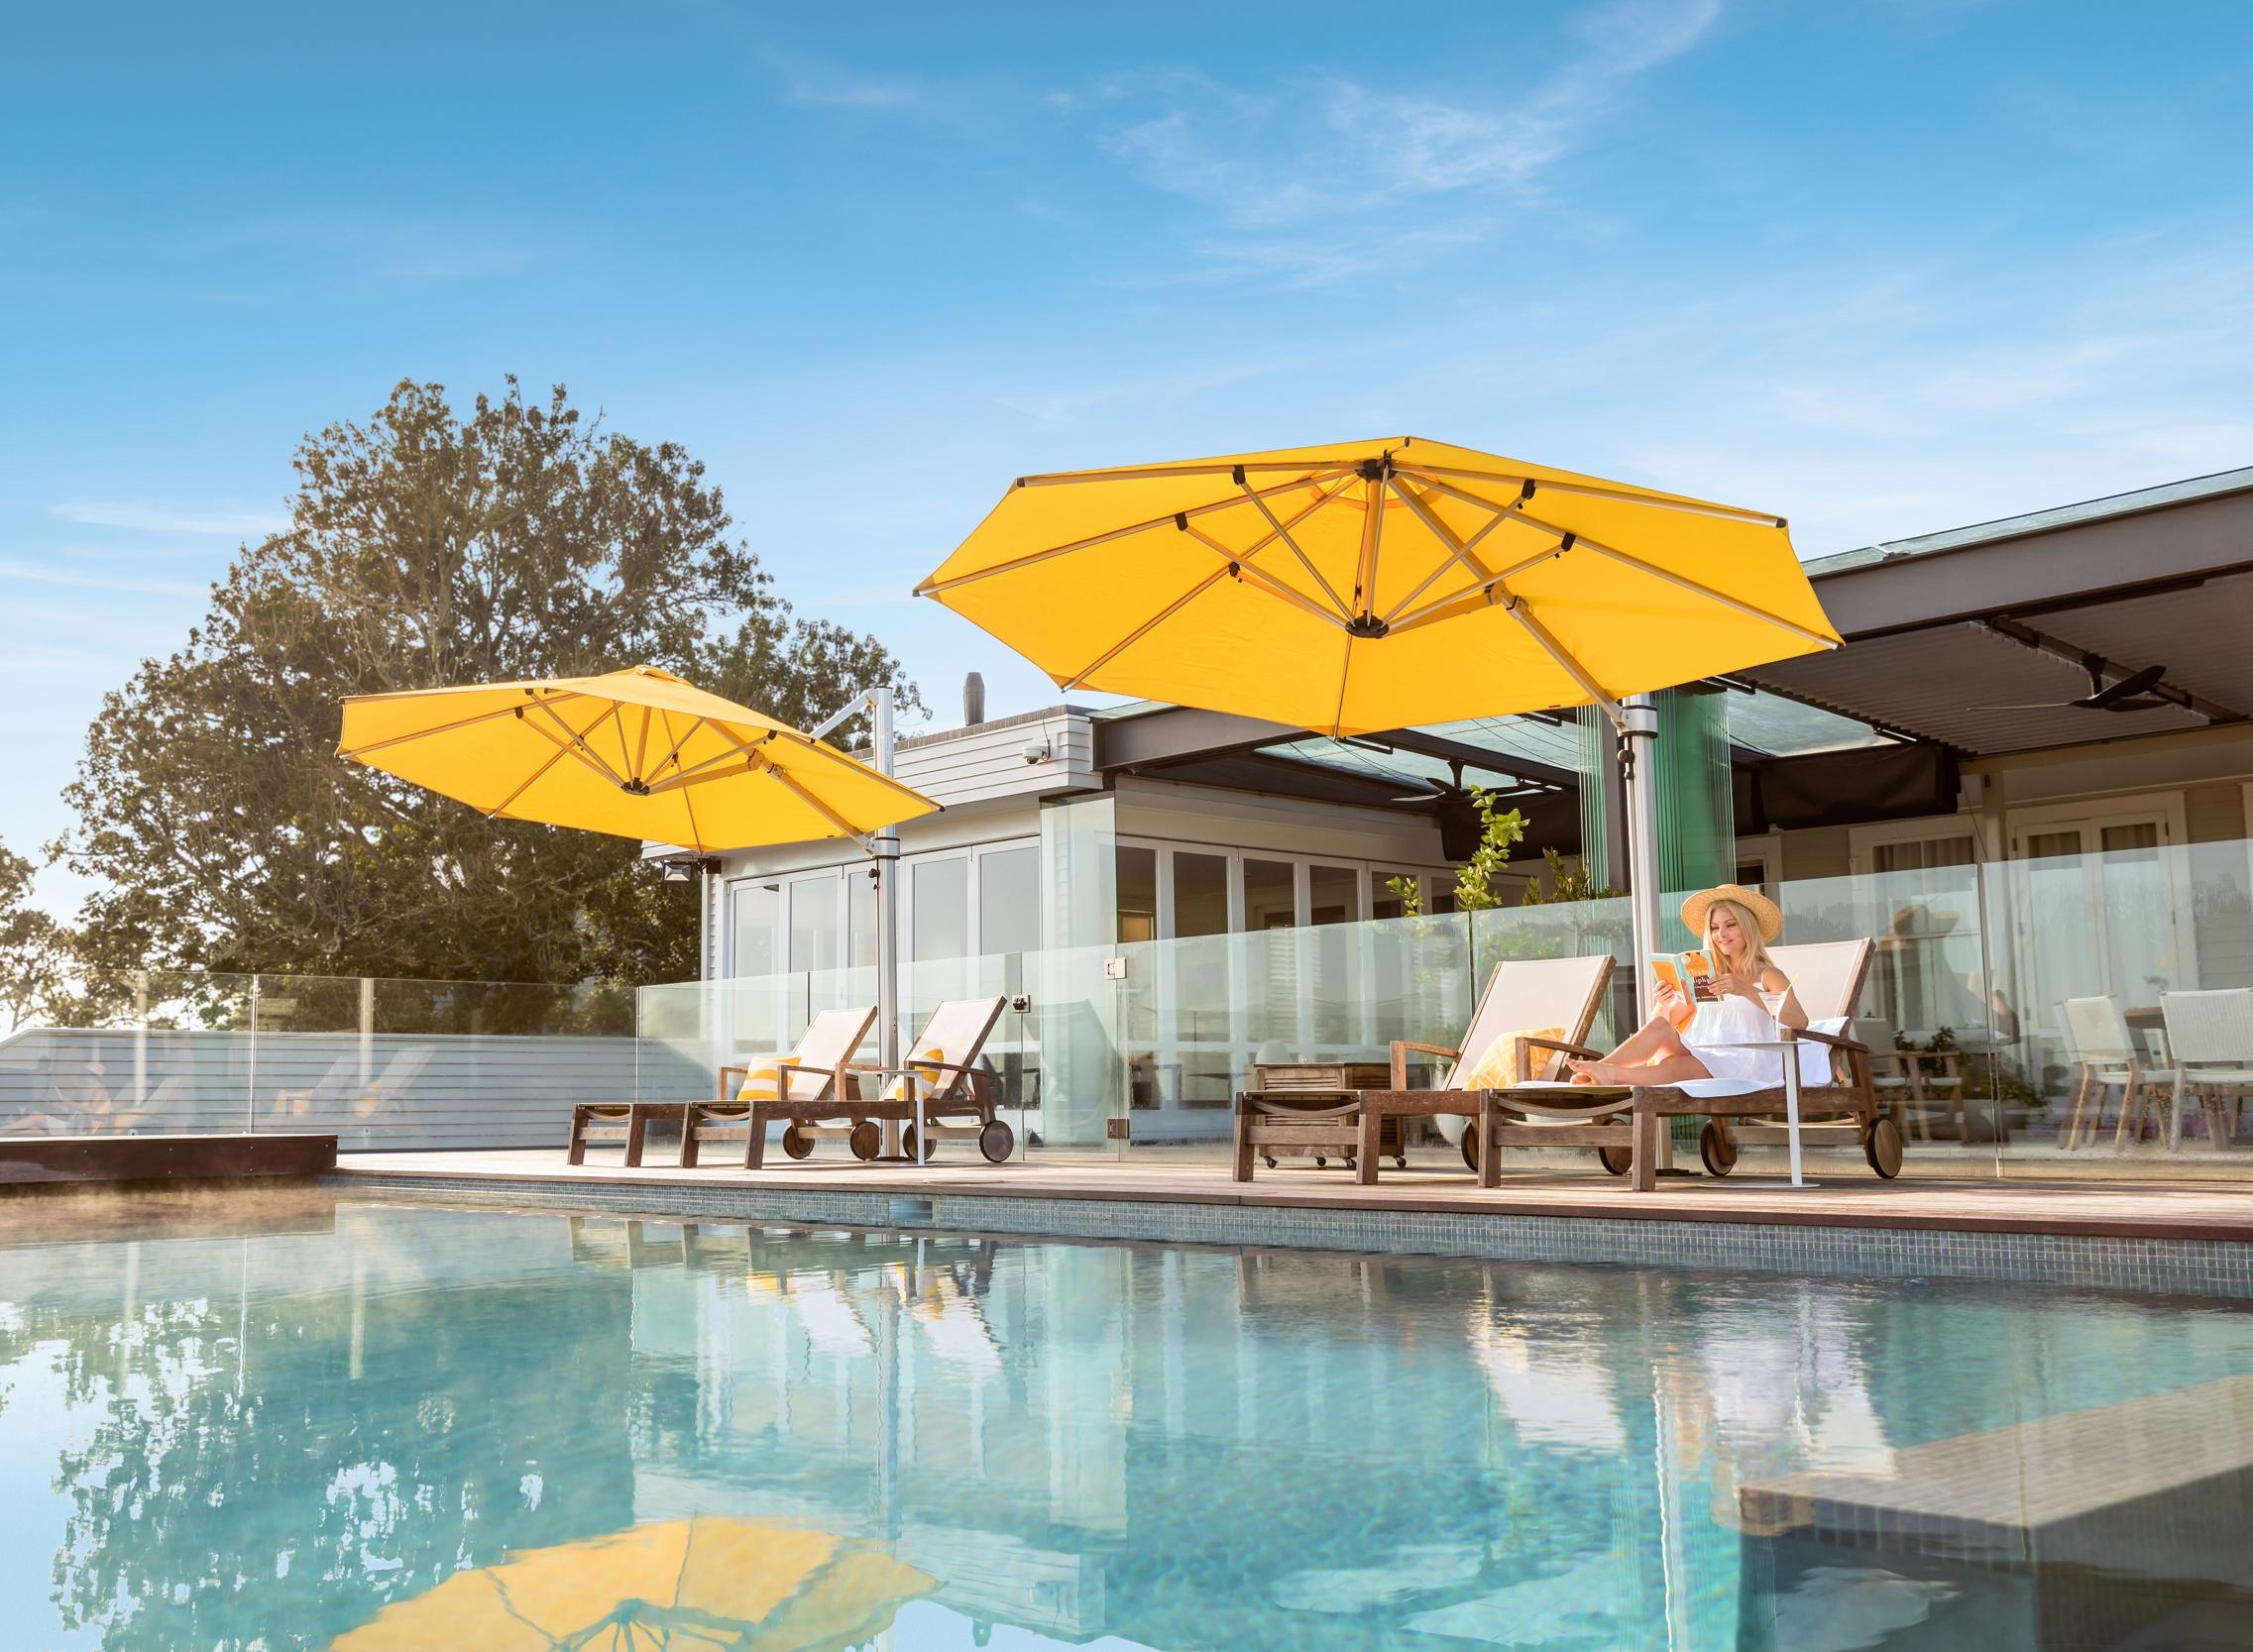 Riviera Cantilever Umbrella By Pool